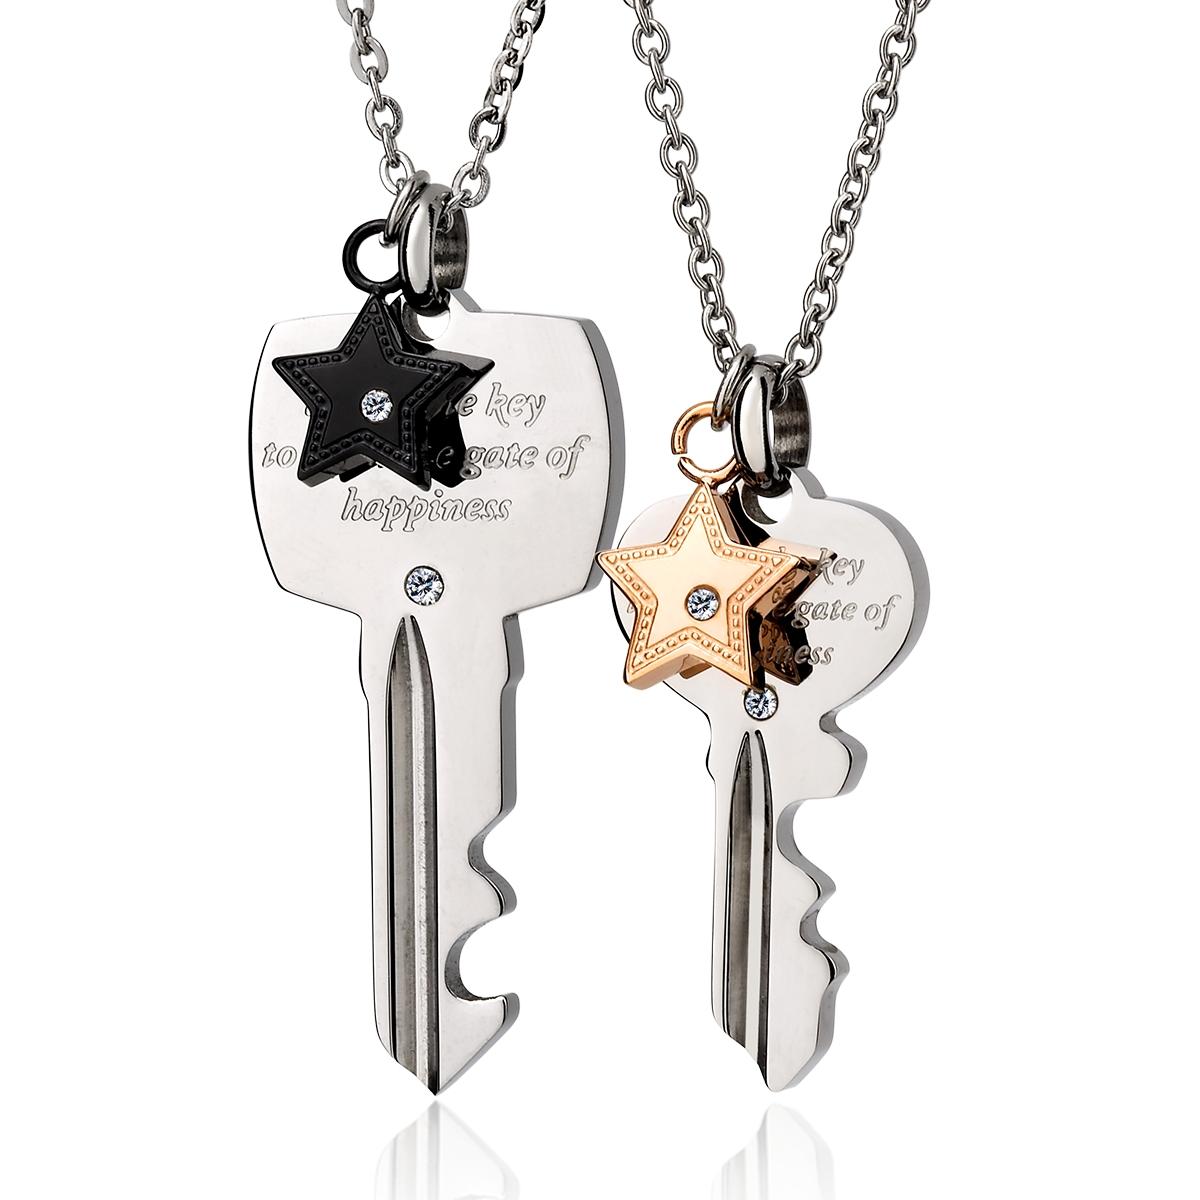 AIH355 愛的心鑰情侶對鍊